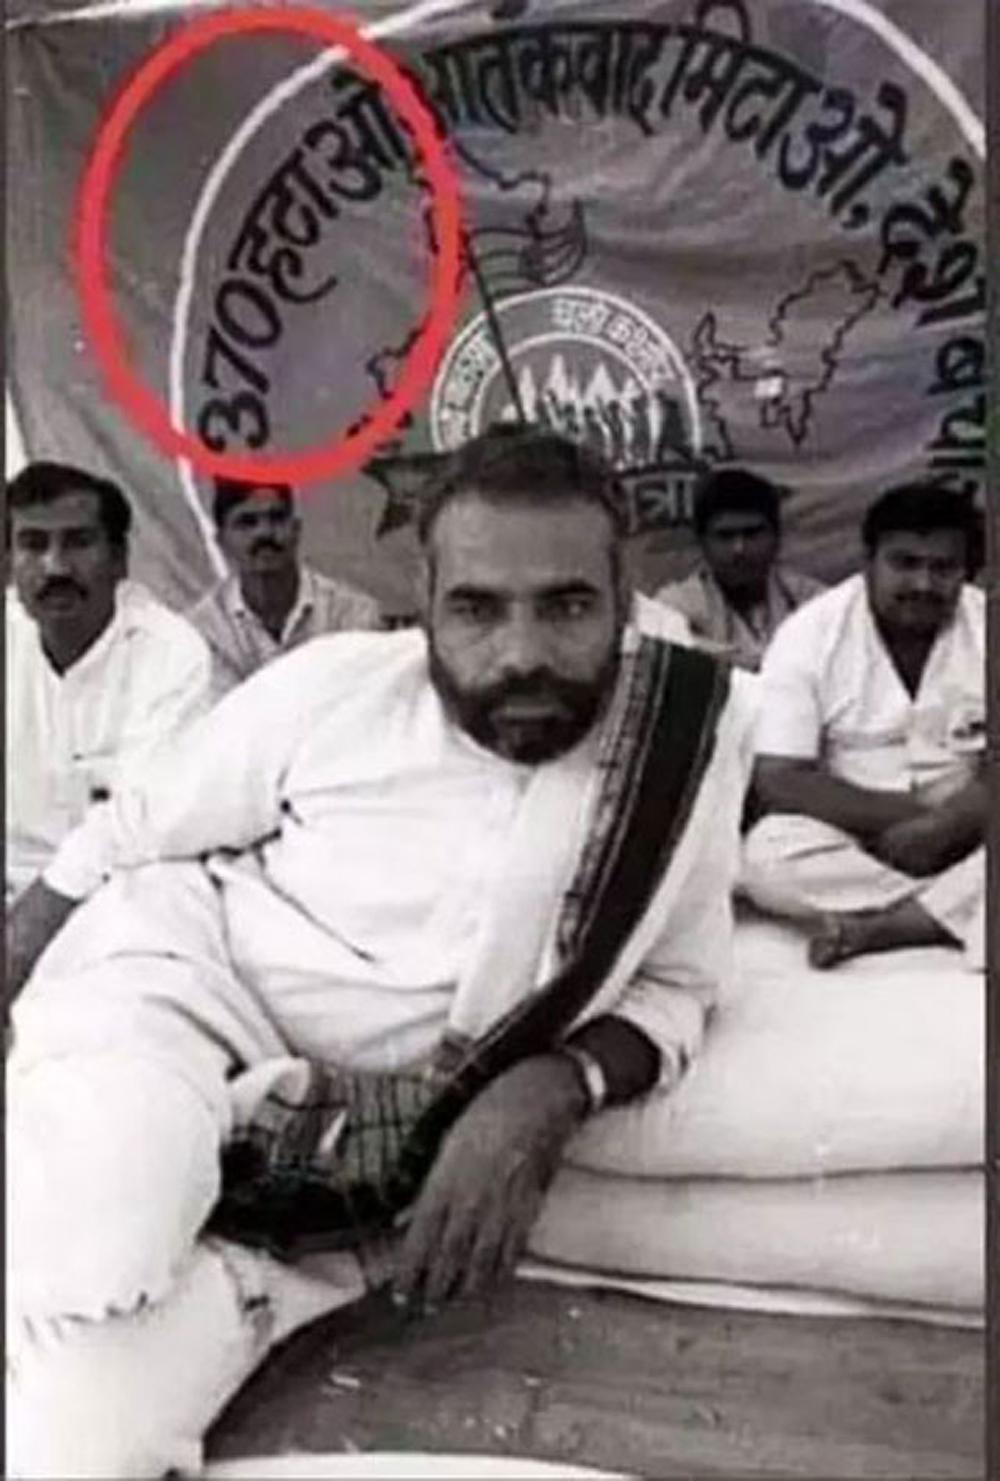 Modi Old Pic Goes On Viral - Telugu Viral News Modi Old Pic Goes On Viral -